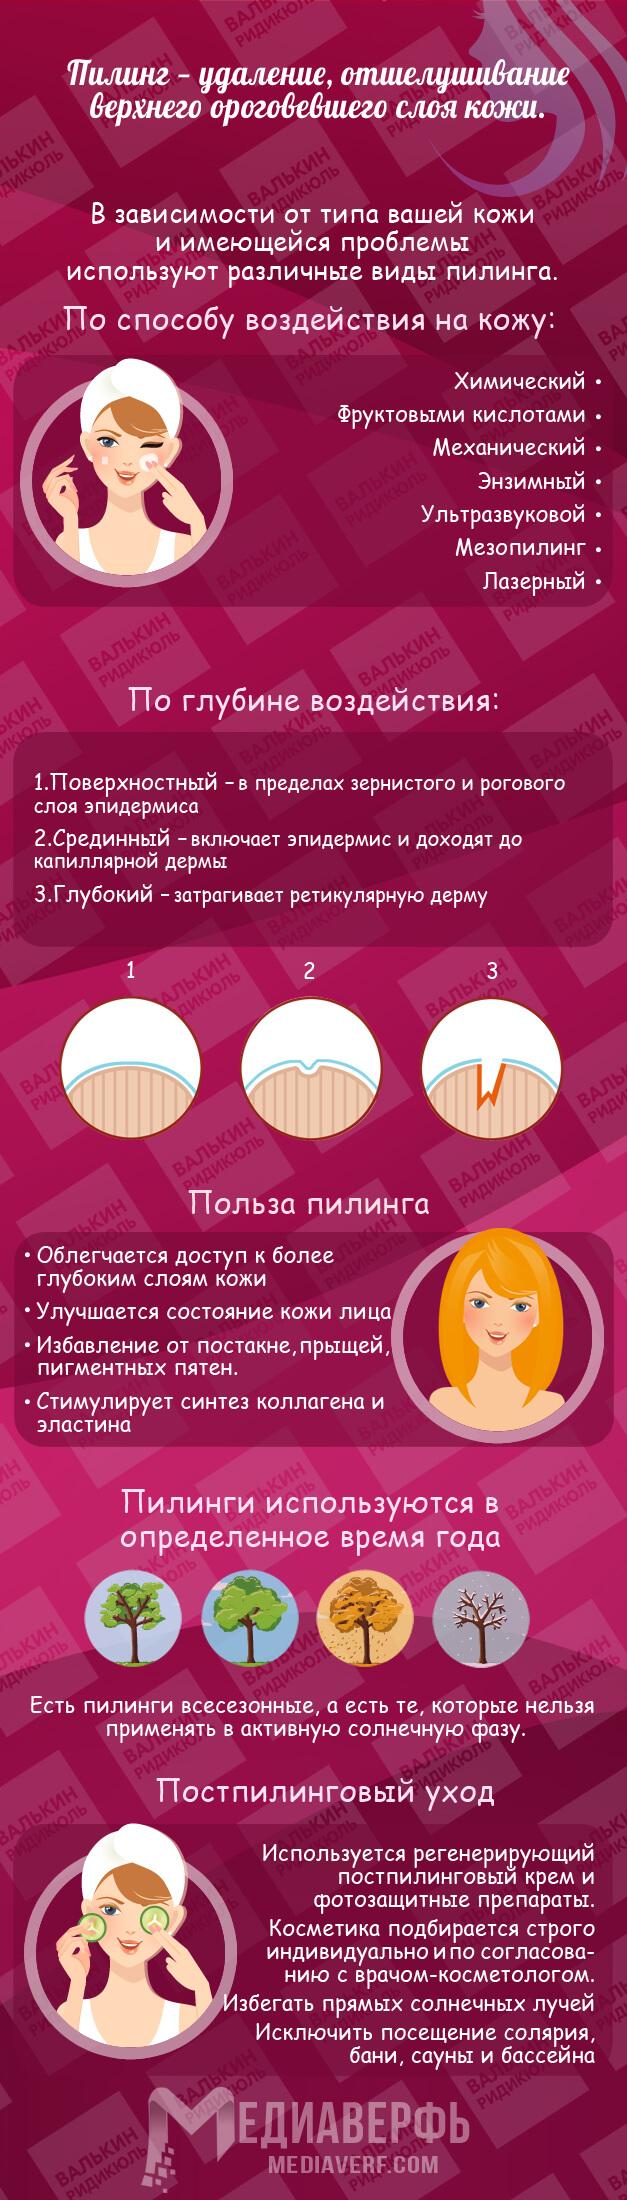 Пилинг Инфографика